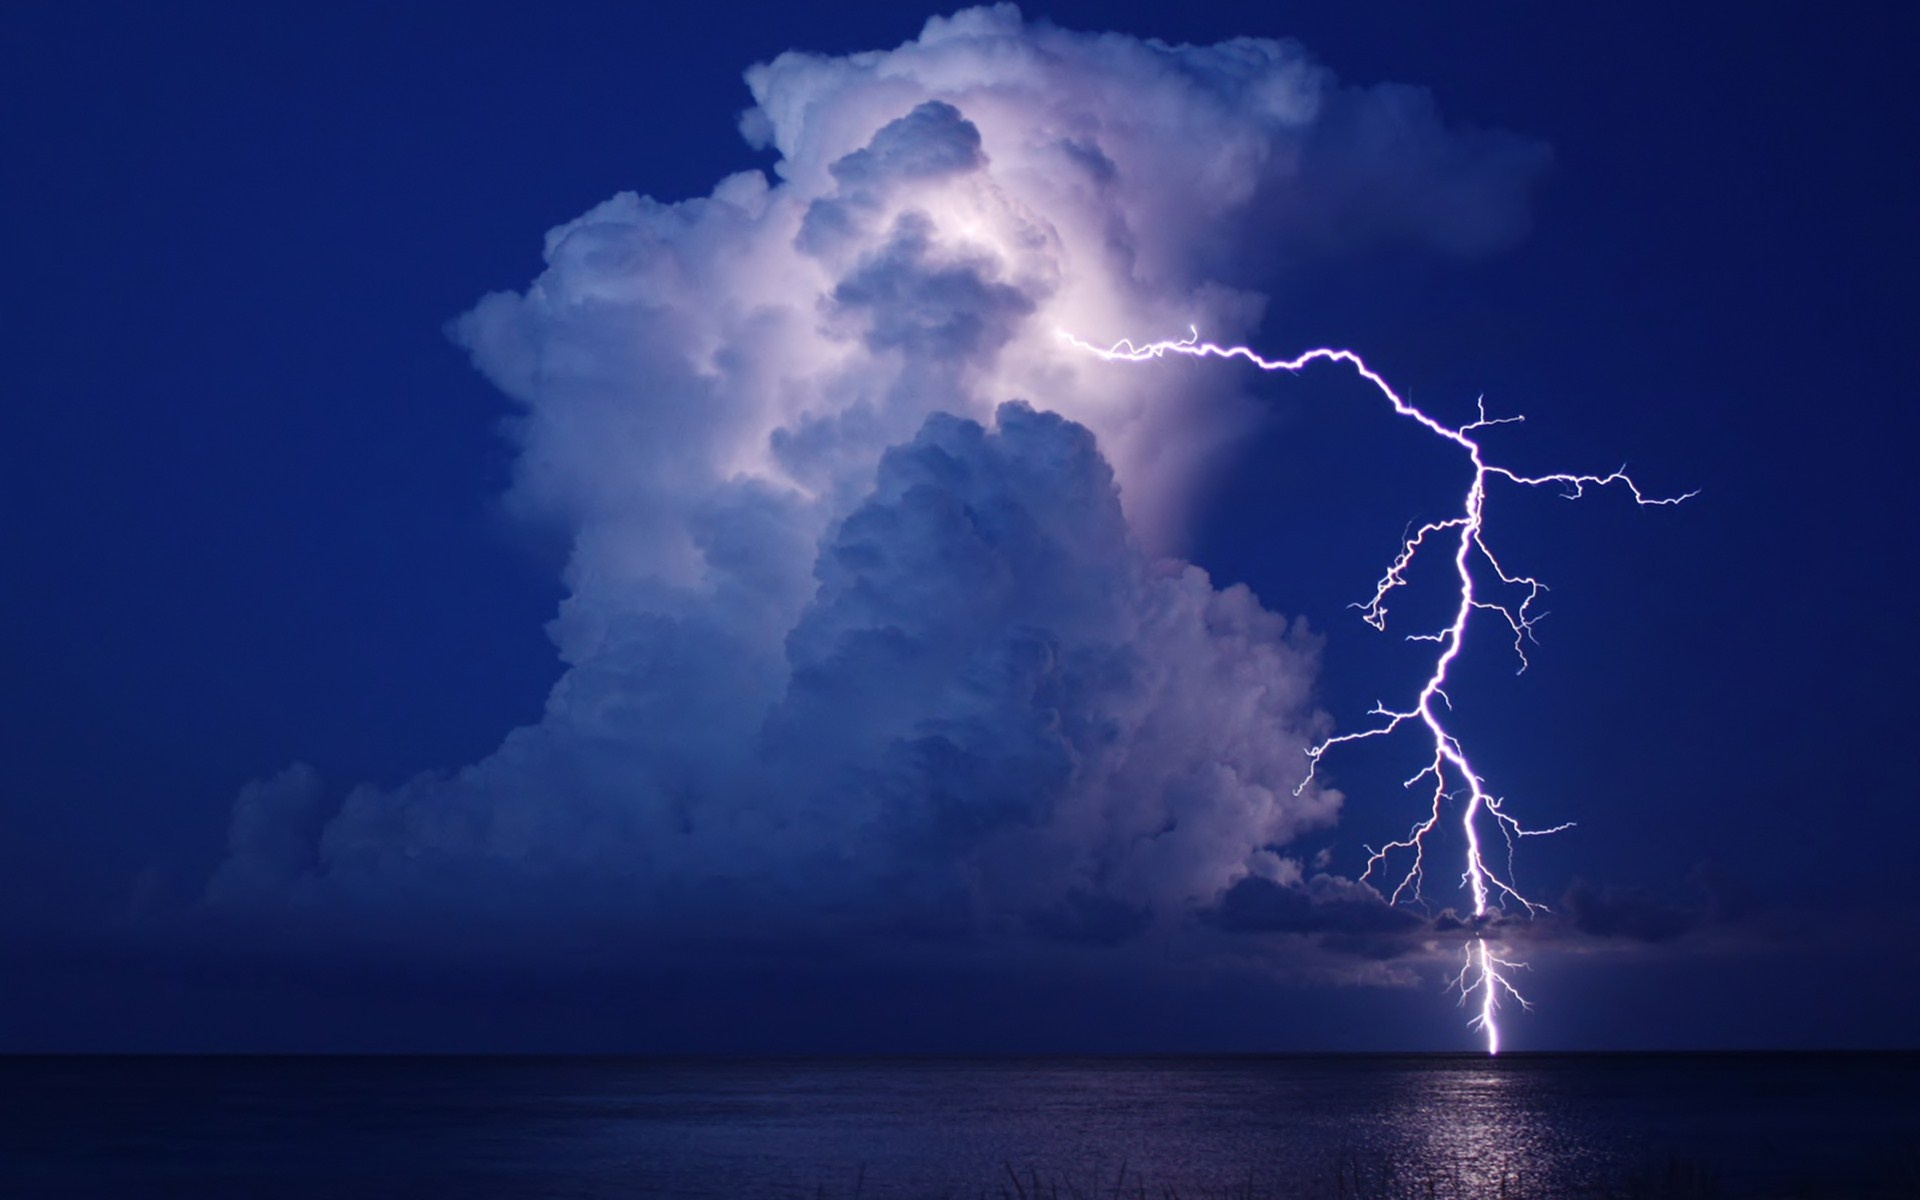 lightning cloud night water storm reflection sea ocean f wallpaper 1920x1200